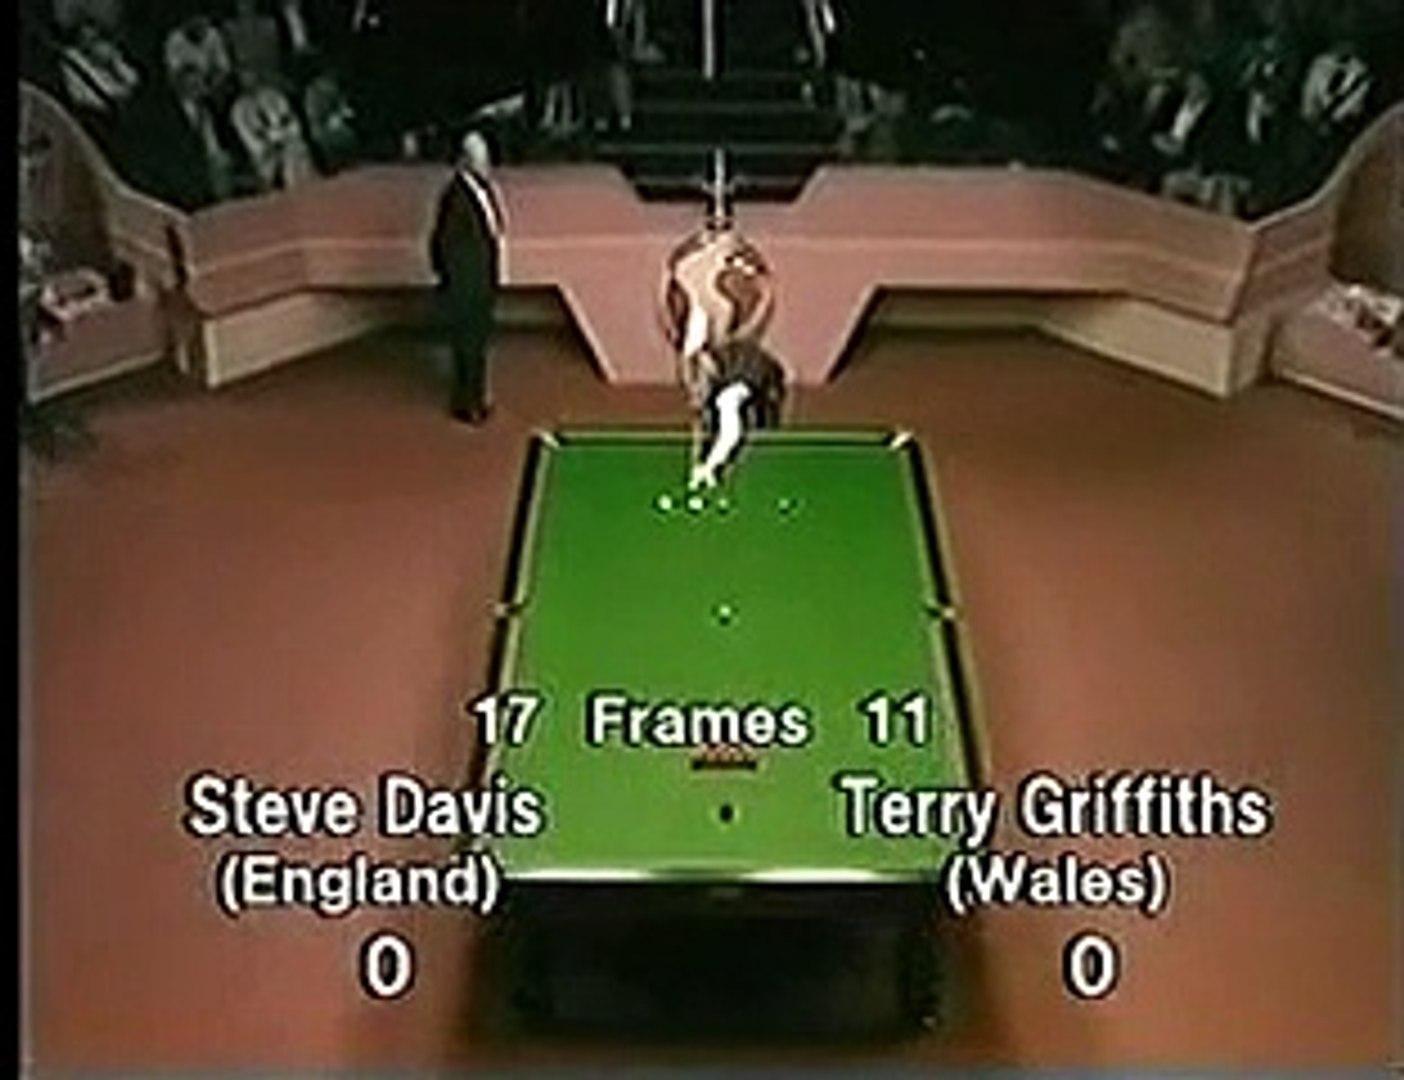 1988 World Snooker Championship